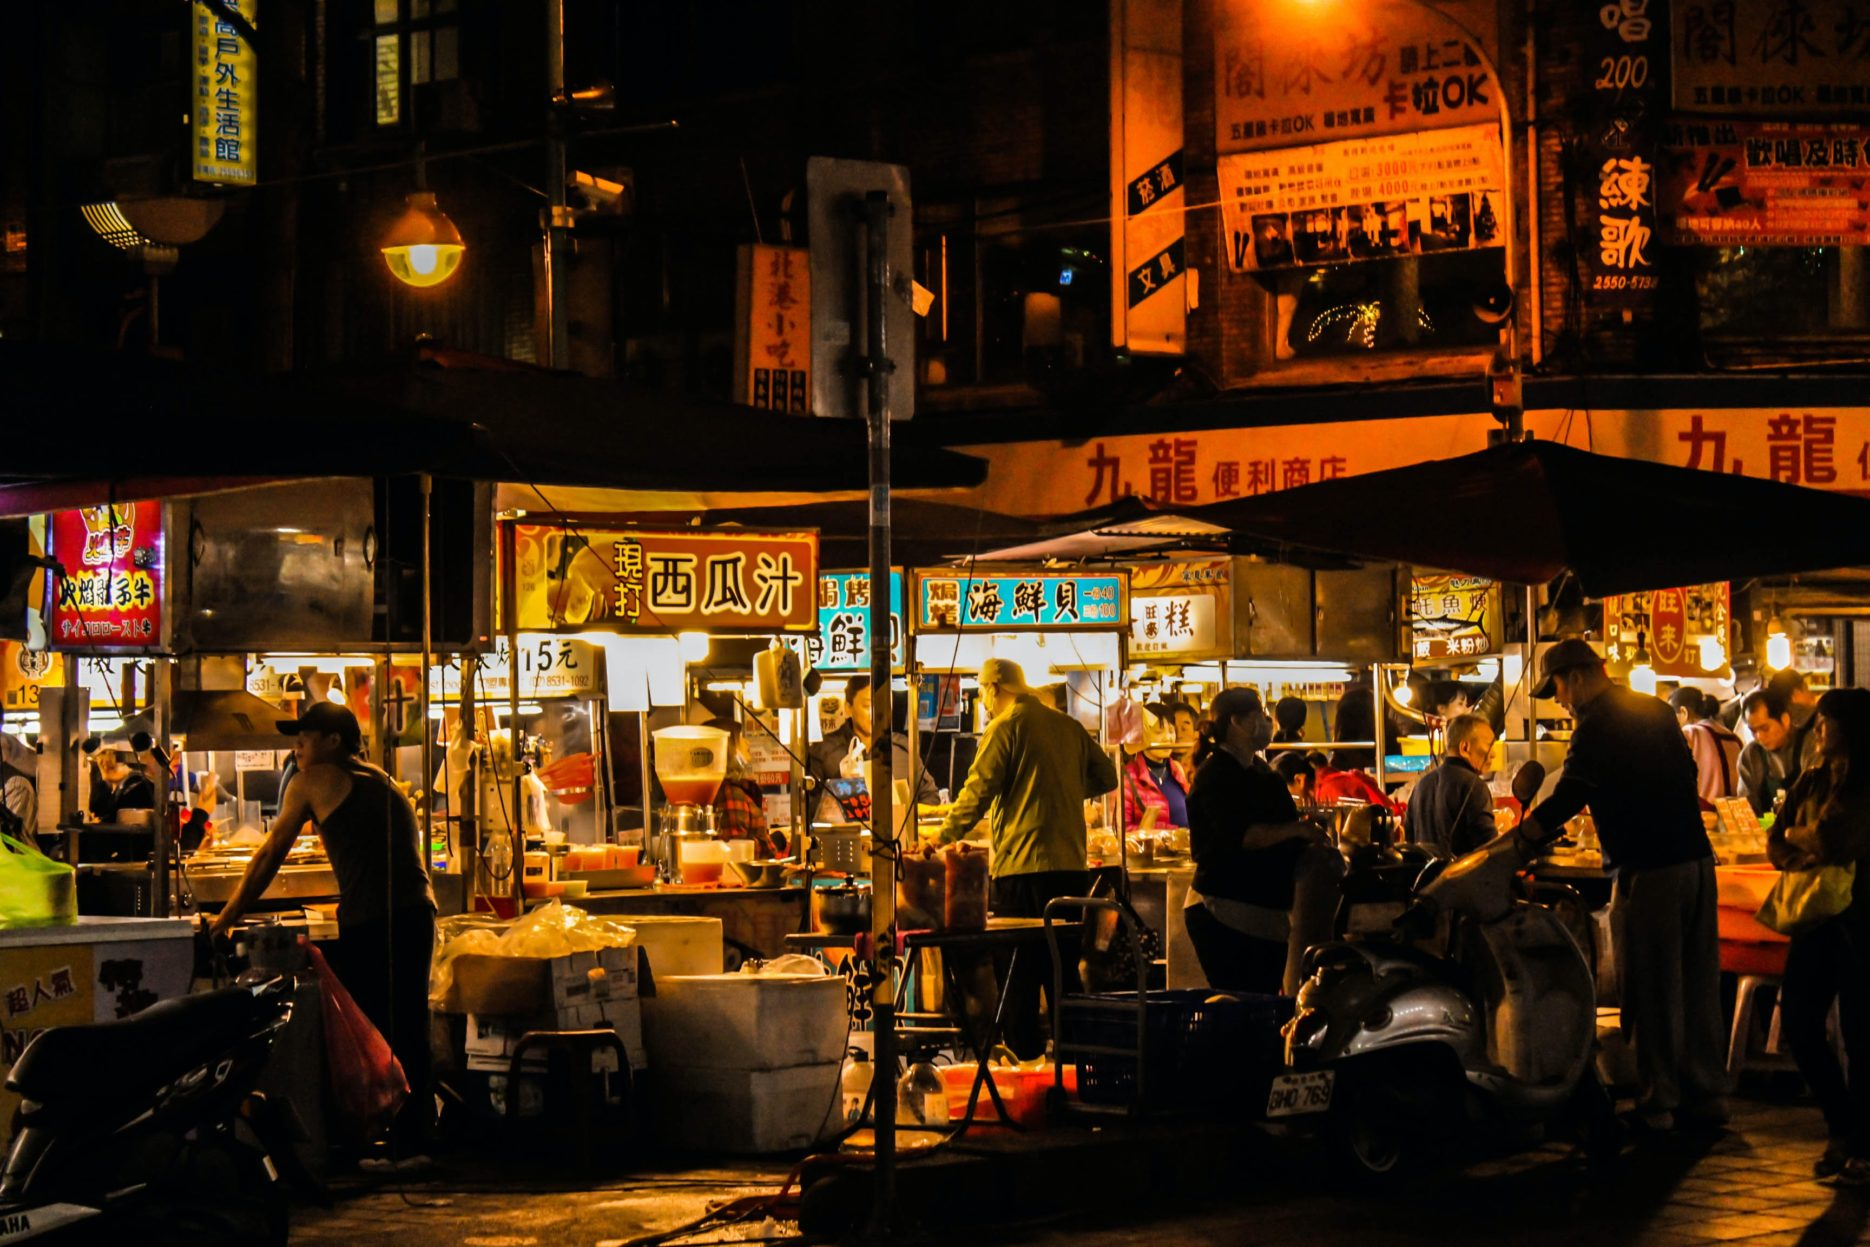 Night market in Asia